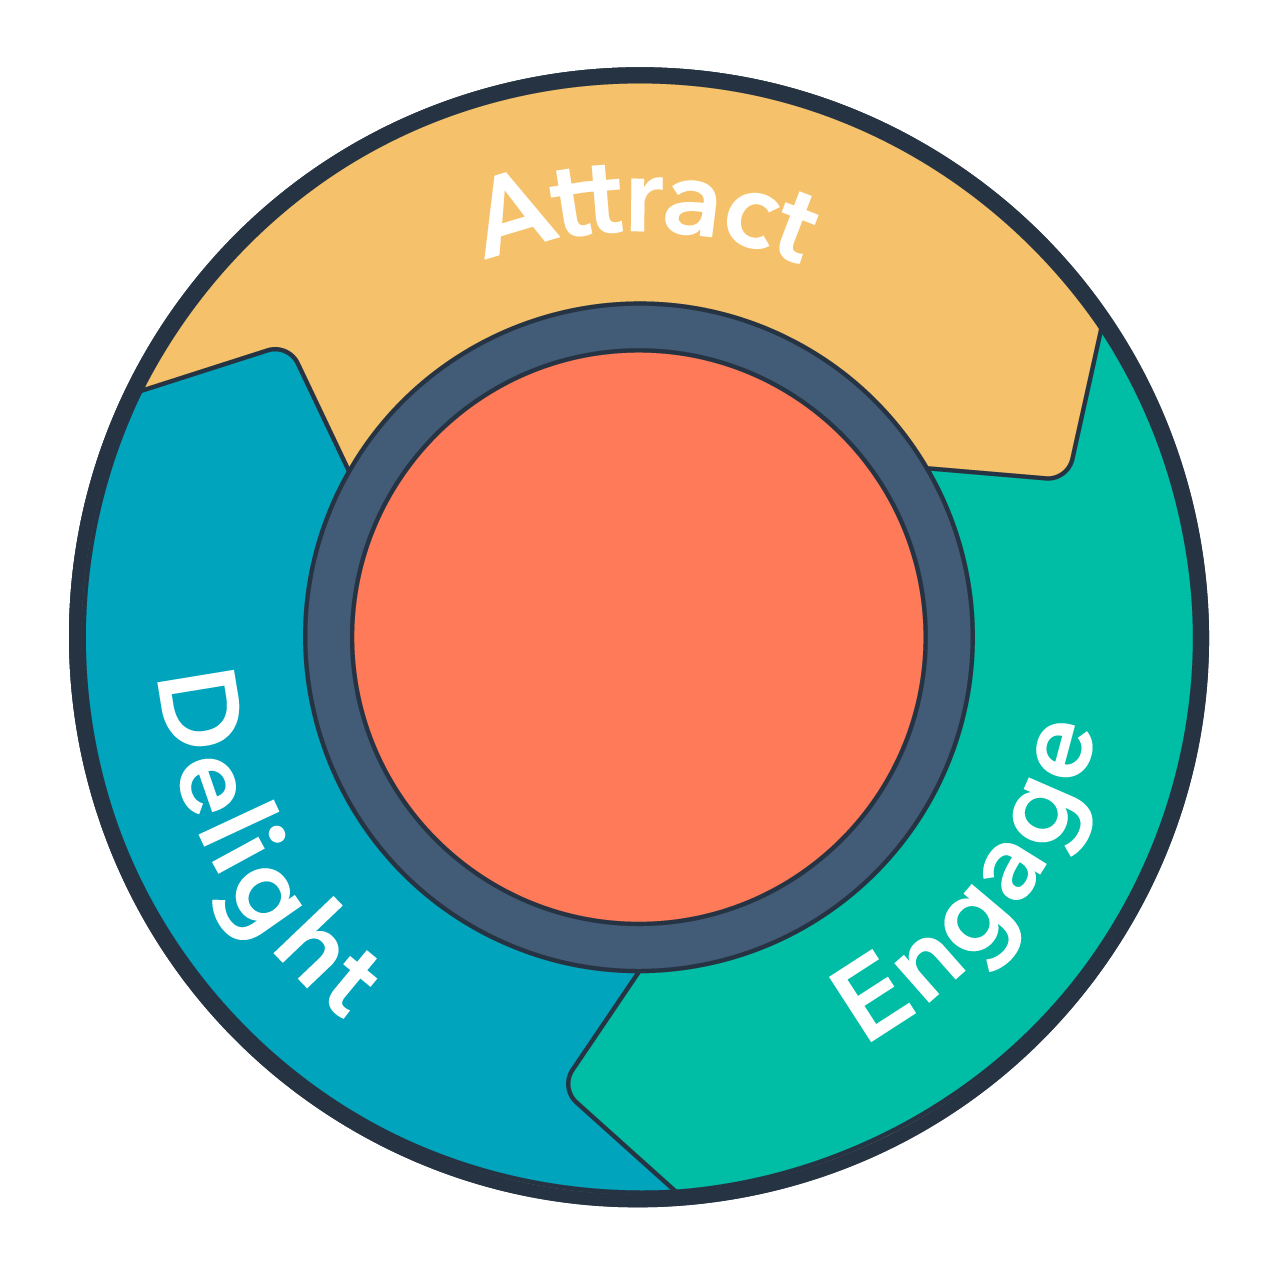 inbound-methodology 인바운드 플라이휠 - 허브스팟 - 헬로디지털 Hellodigital